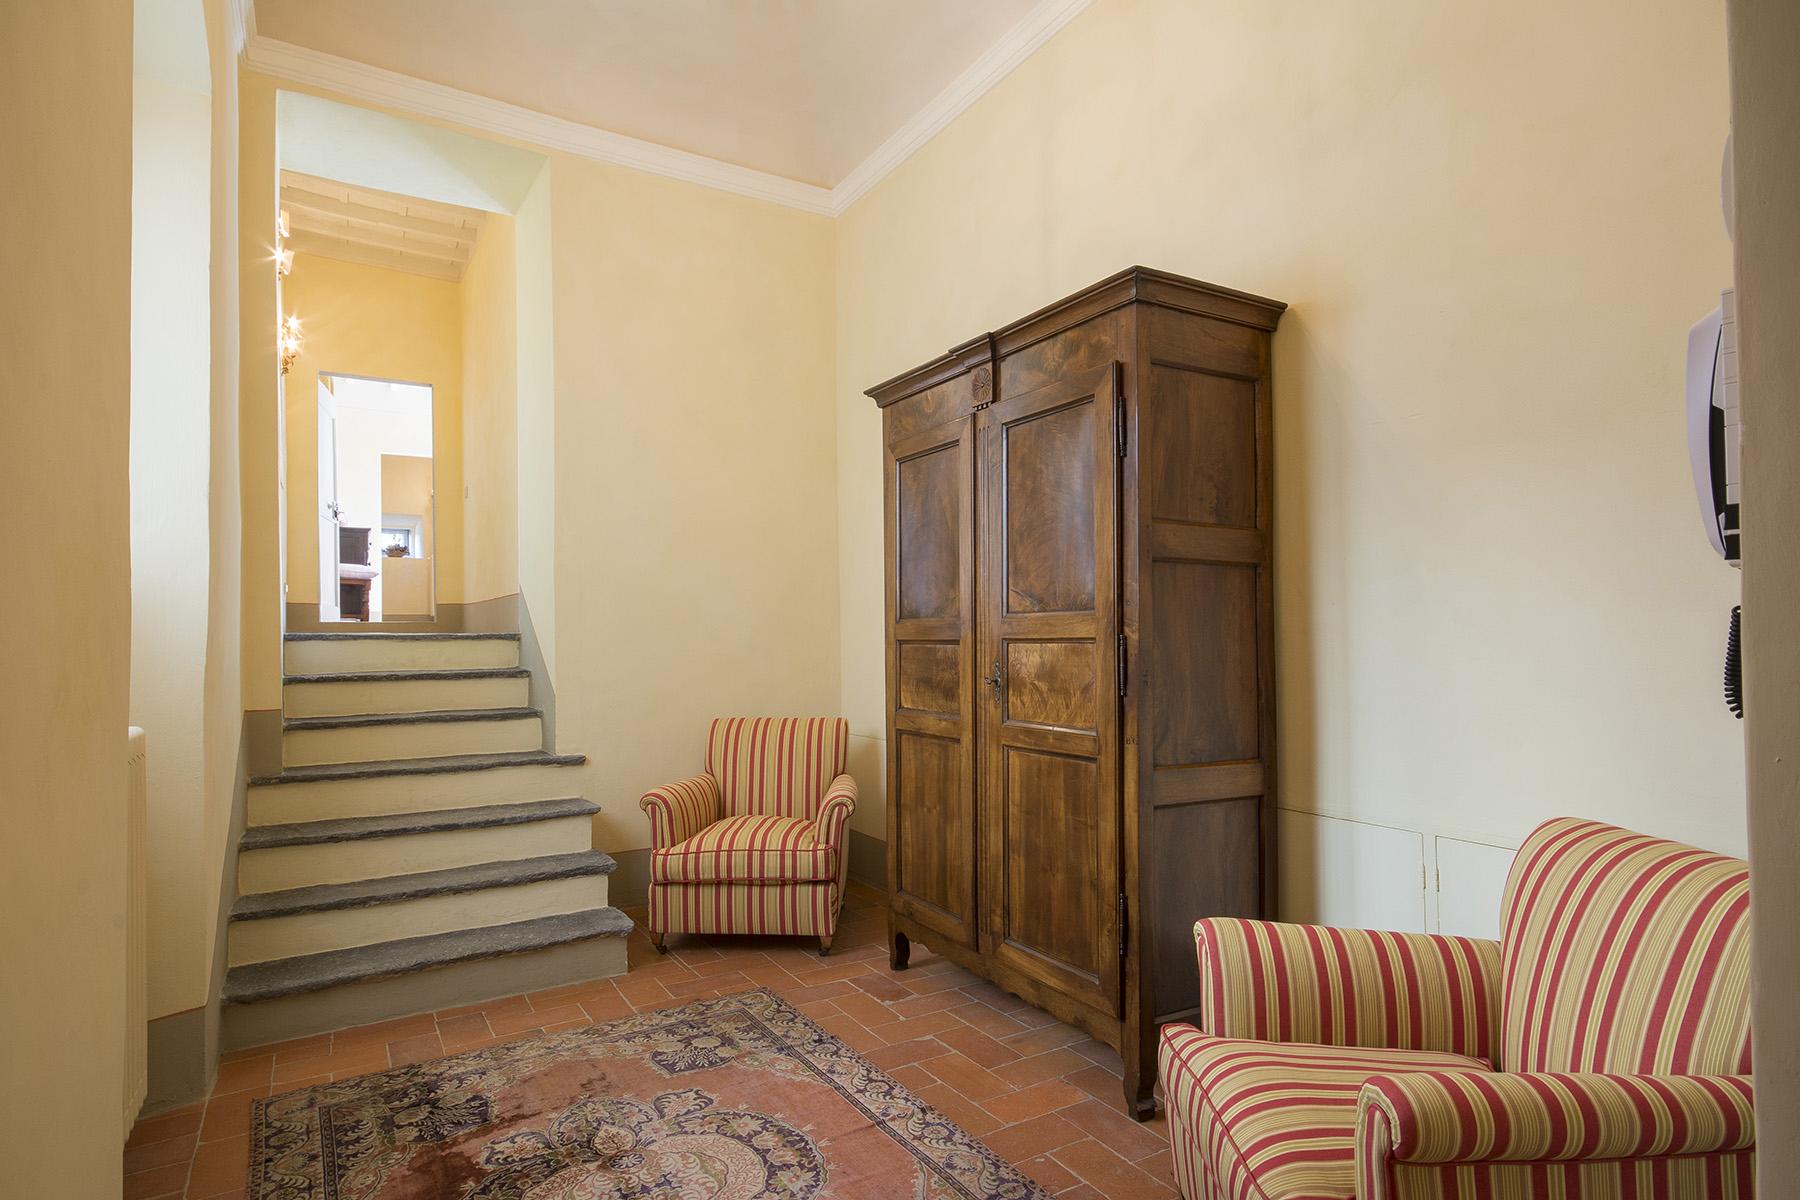 Villa in Affitto a Impruneta: 5 locali, 560 mq - Foto 7